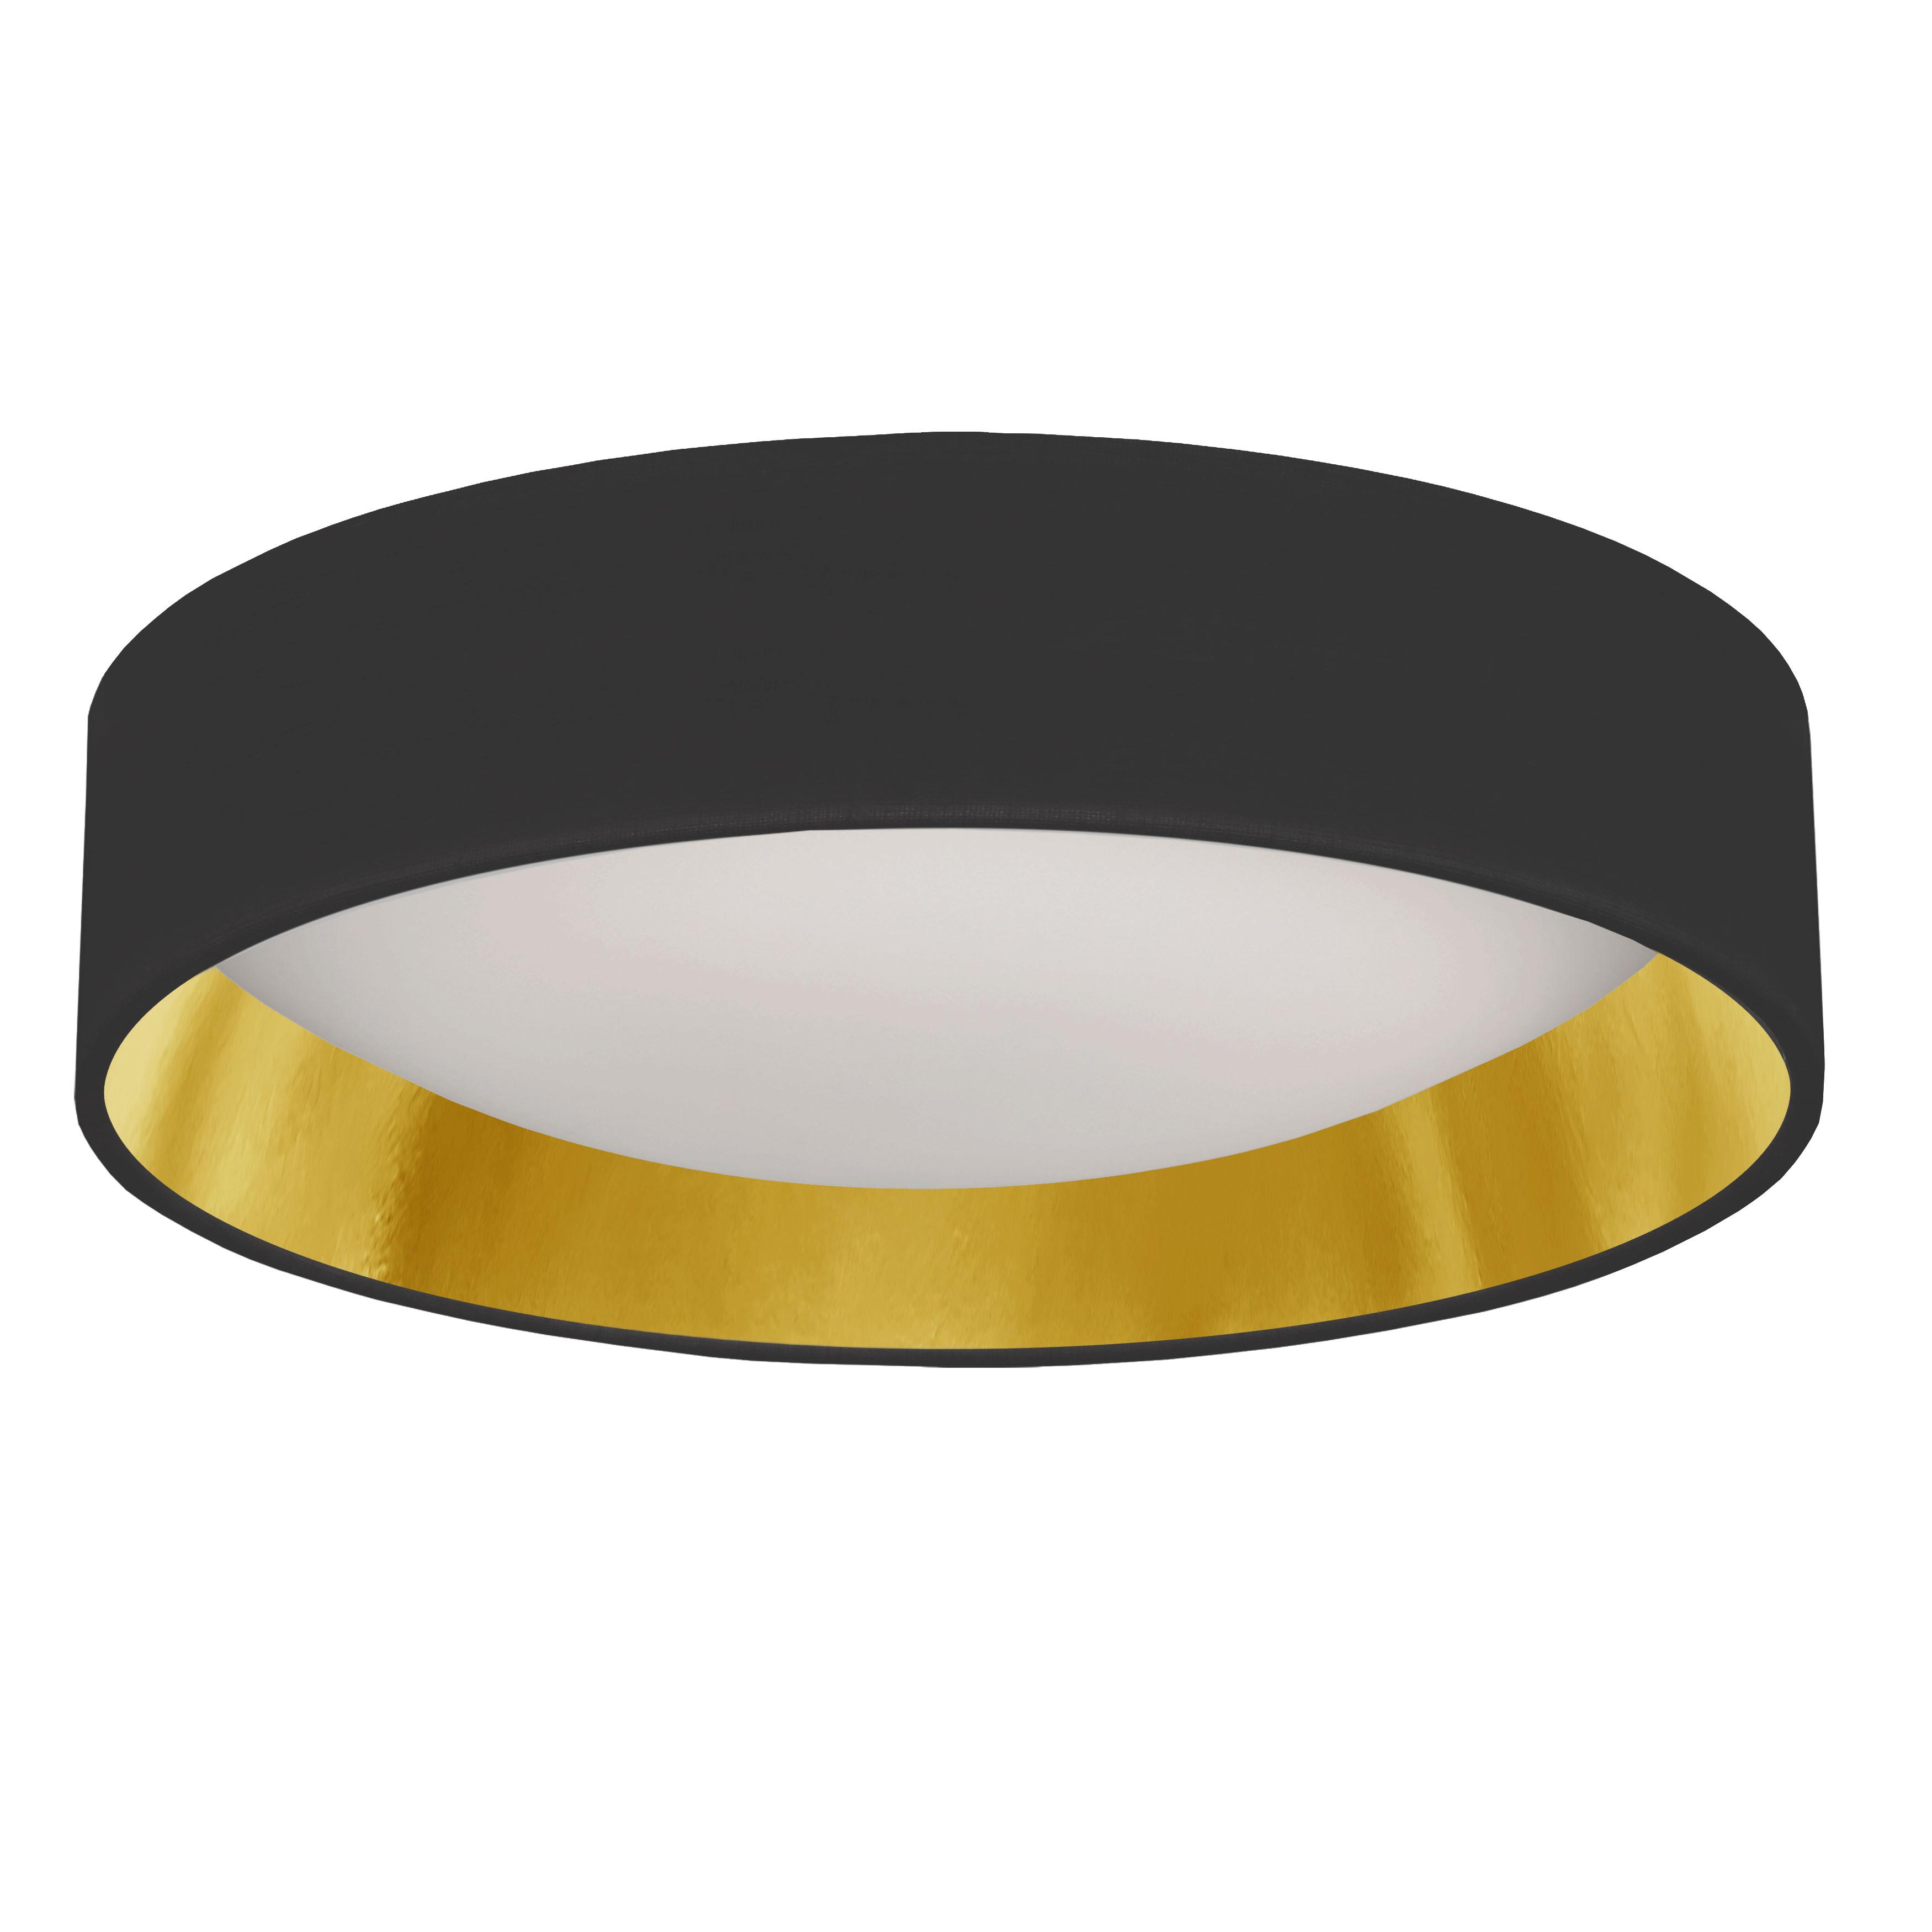 "15"" Light Flush Mount Fixture Black/Gold Shade"